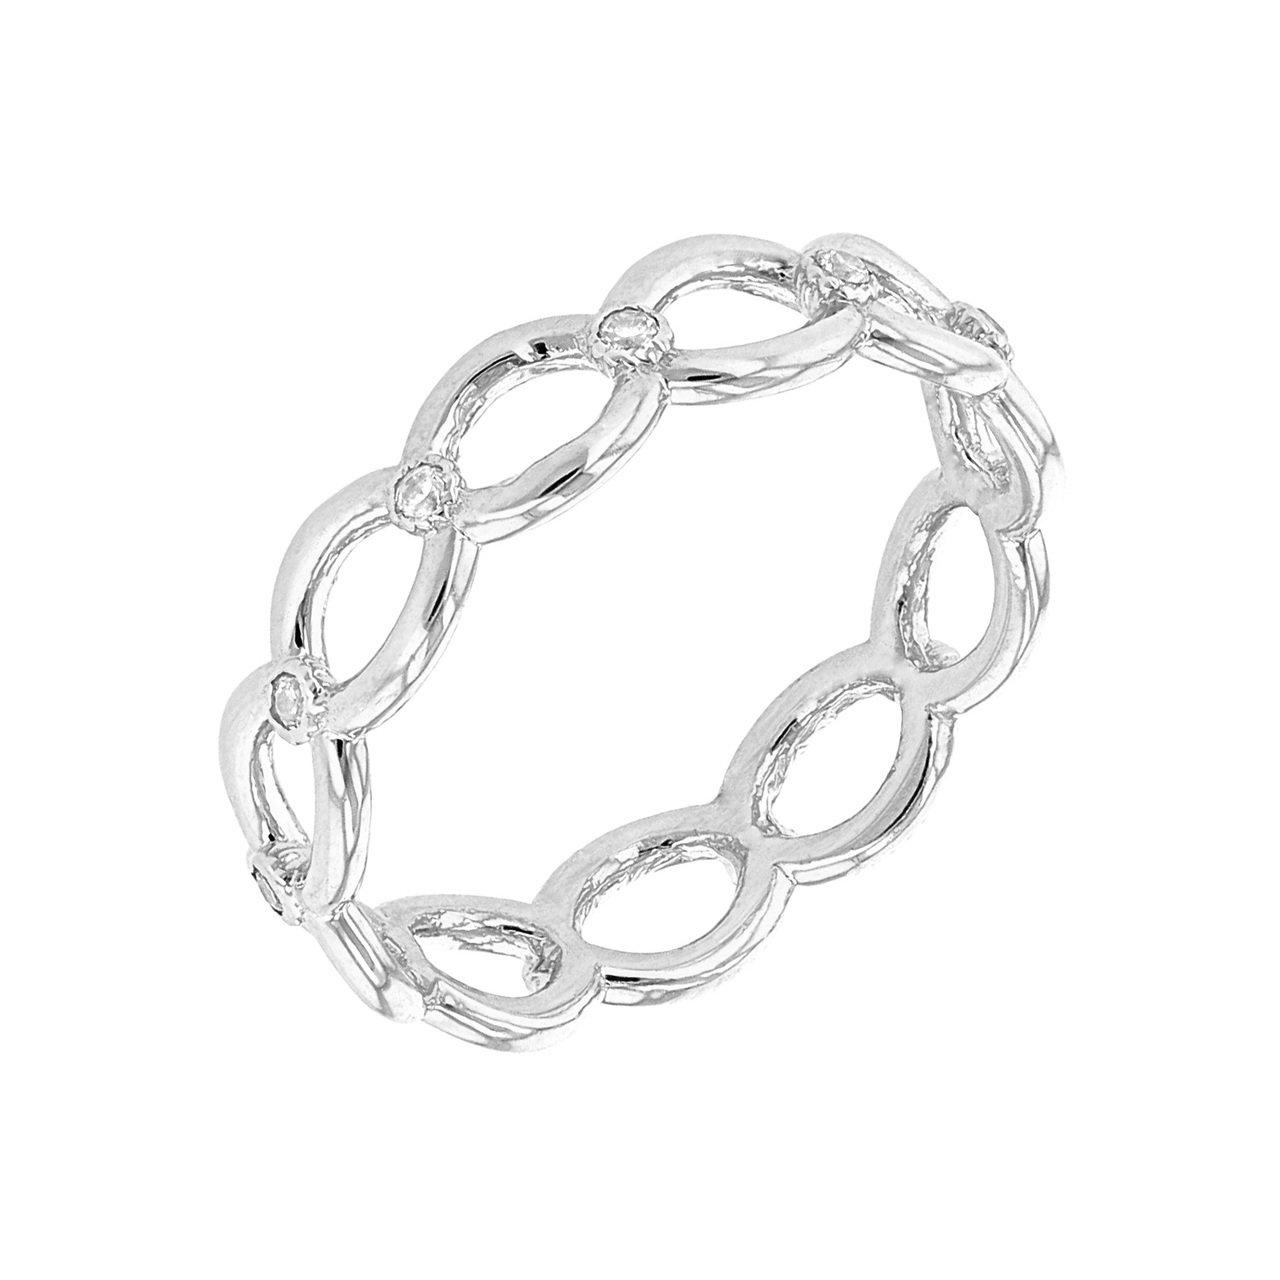 Dainty 14k White Gold Diamond Infinity/Eternity Band (Size 6)